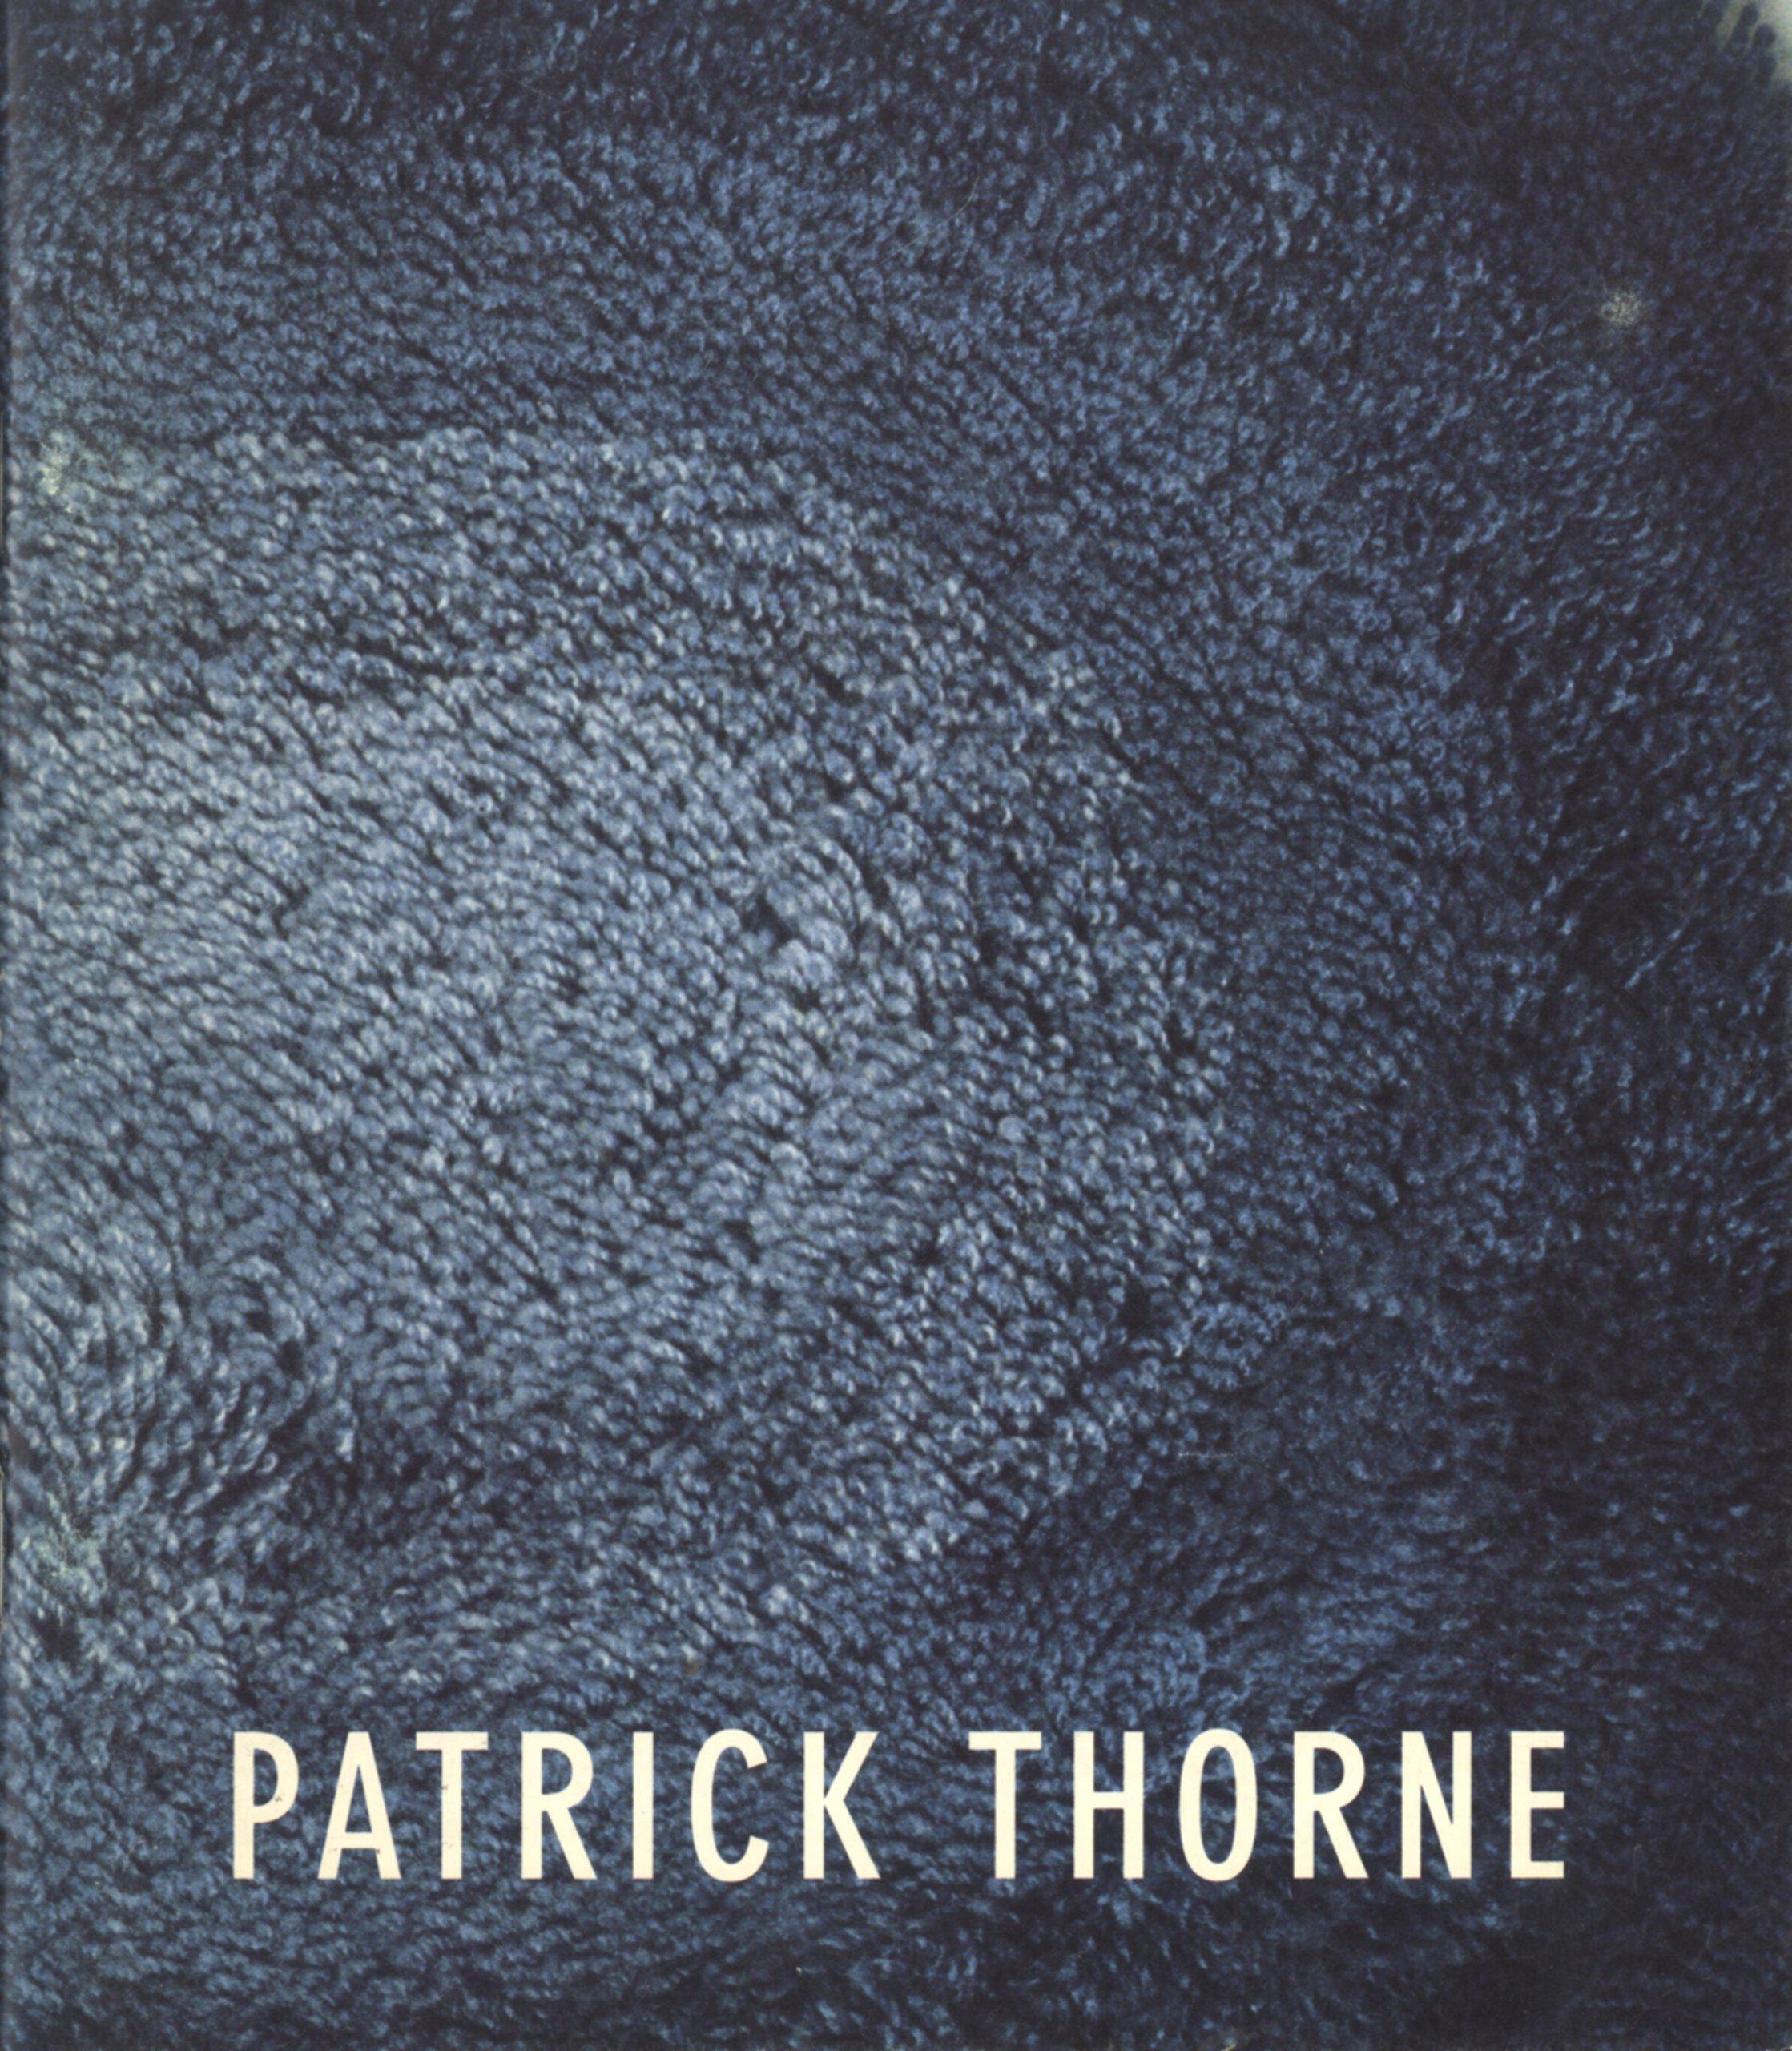 patrick thorne may 17 june 30 1997